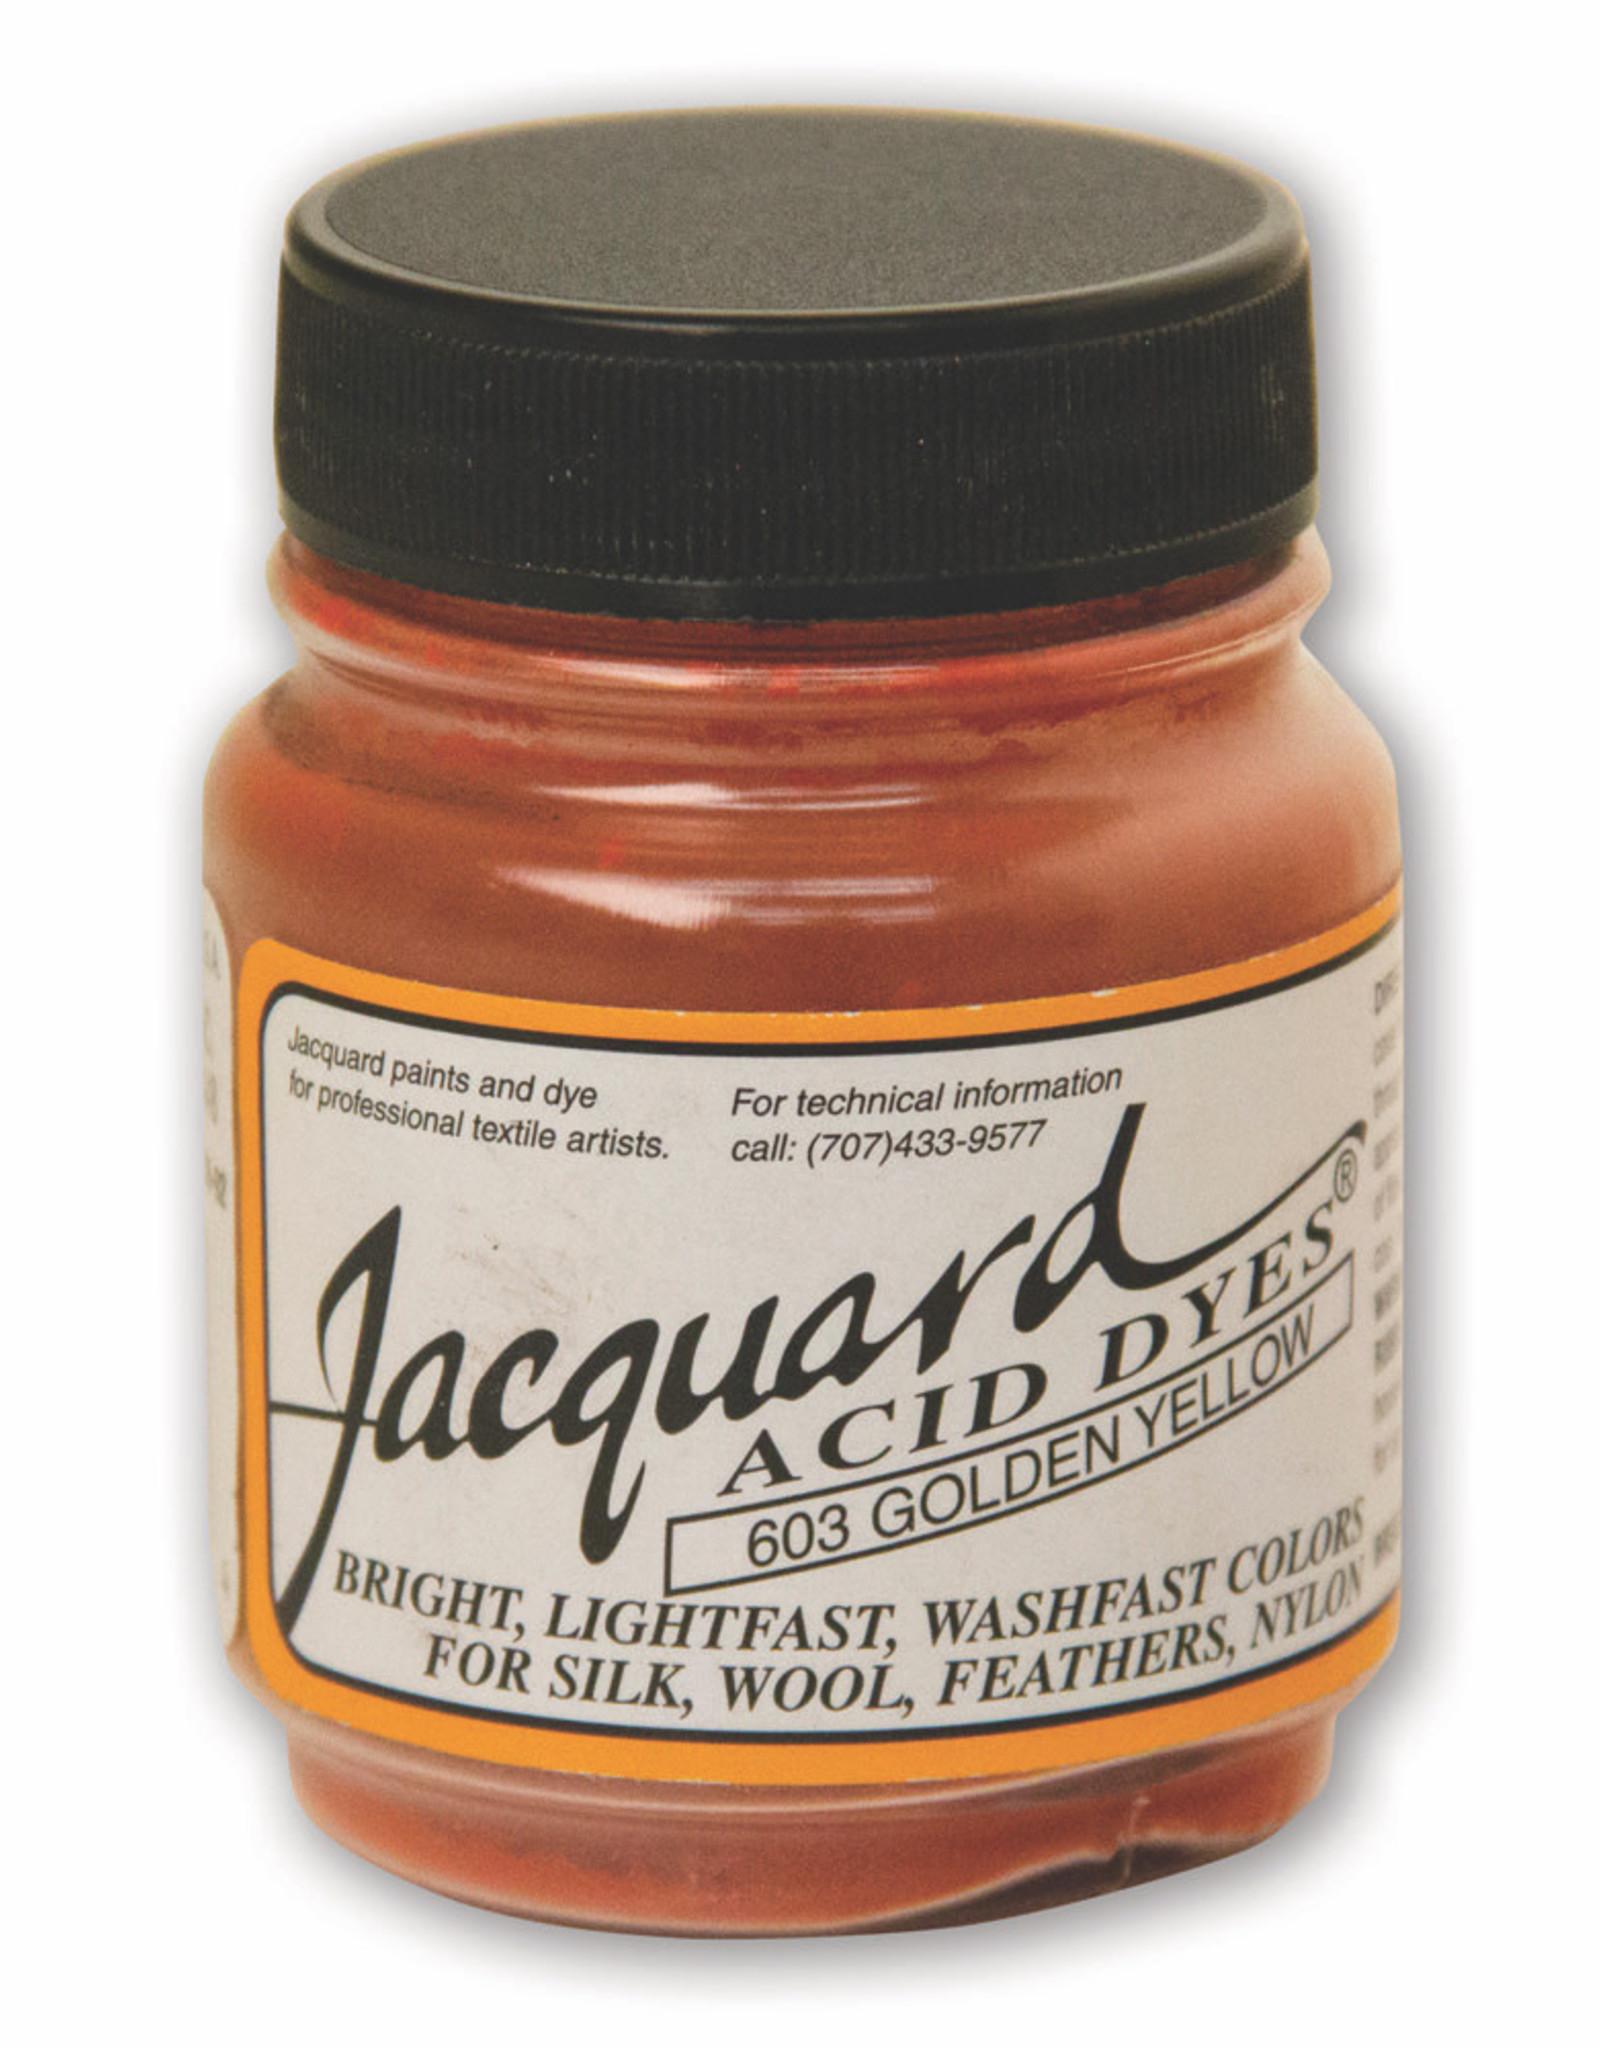 Jacquard Jacquard Acid Dye #603 Golden Yellow 1/2oz